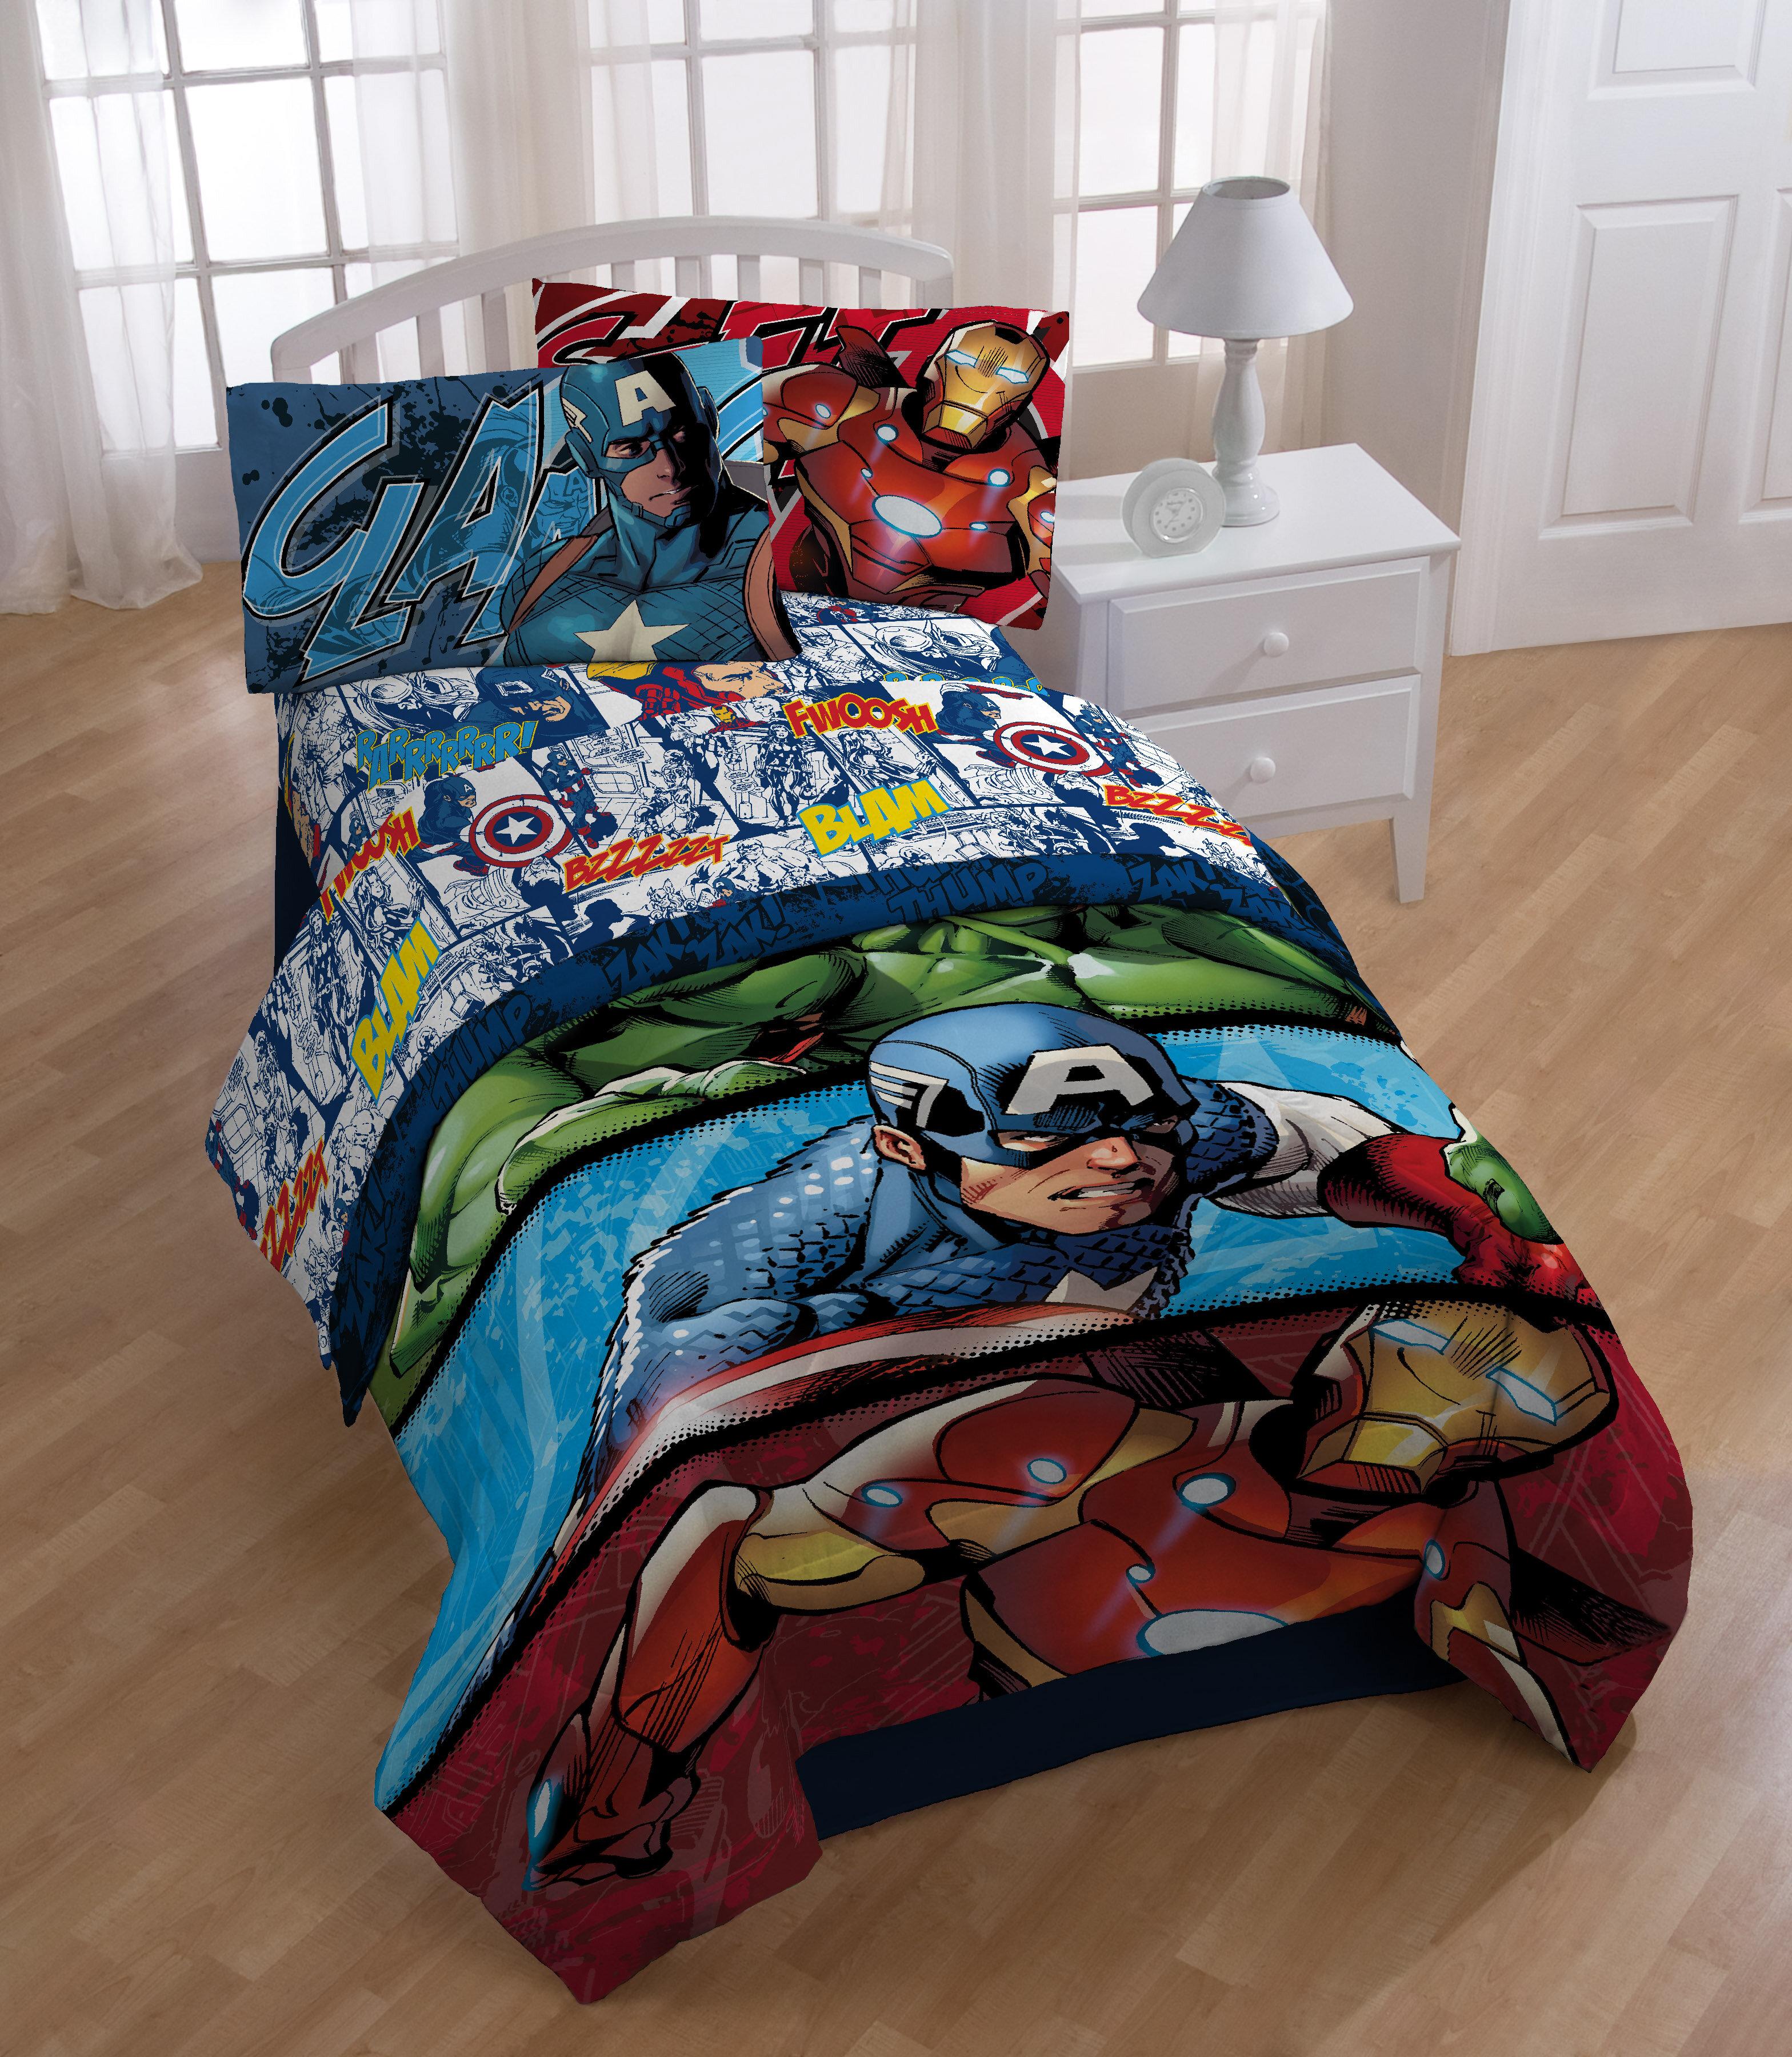 comforter tesco official accessories americapadvisers comics asda secrets baby happy bedding single range duvets bedroom at marvel avengers for george